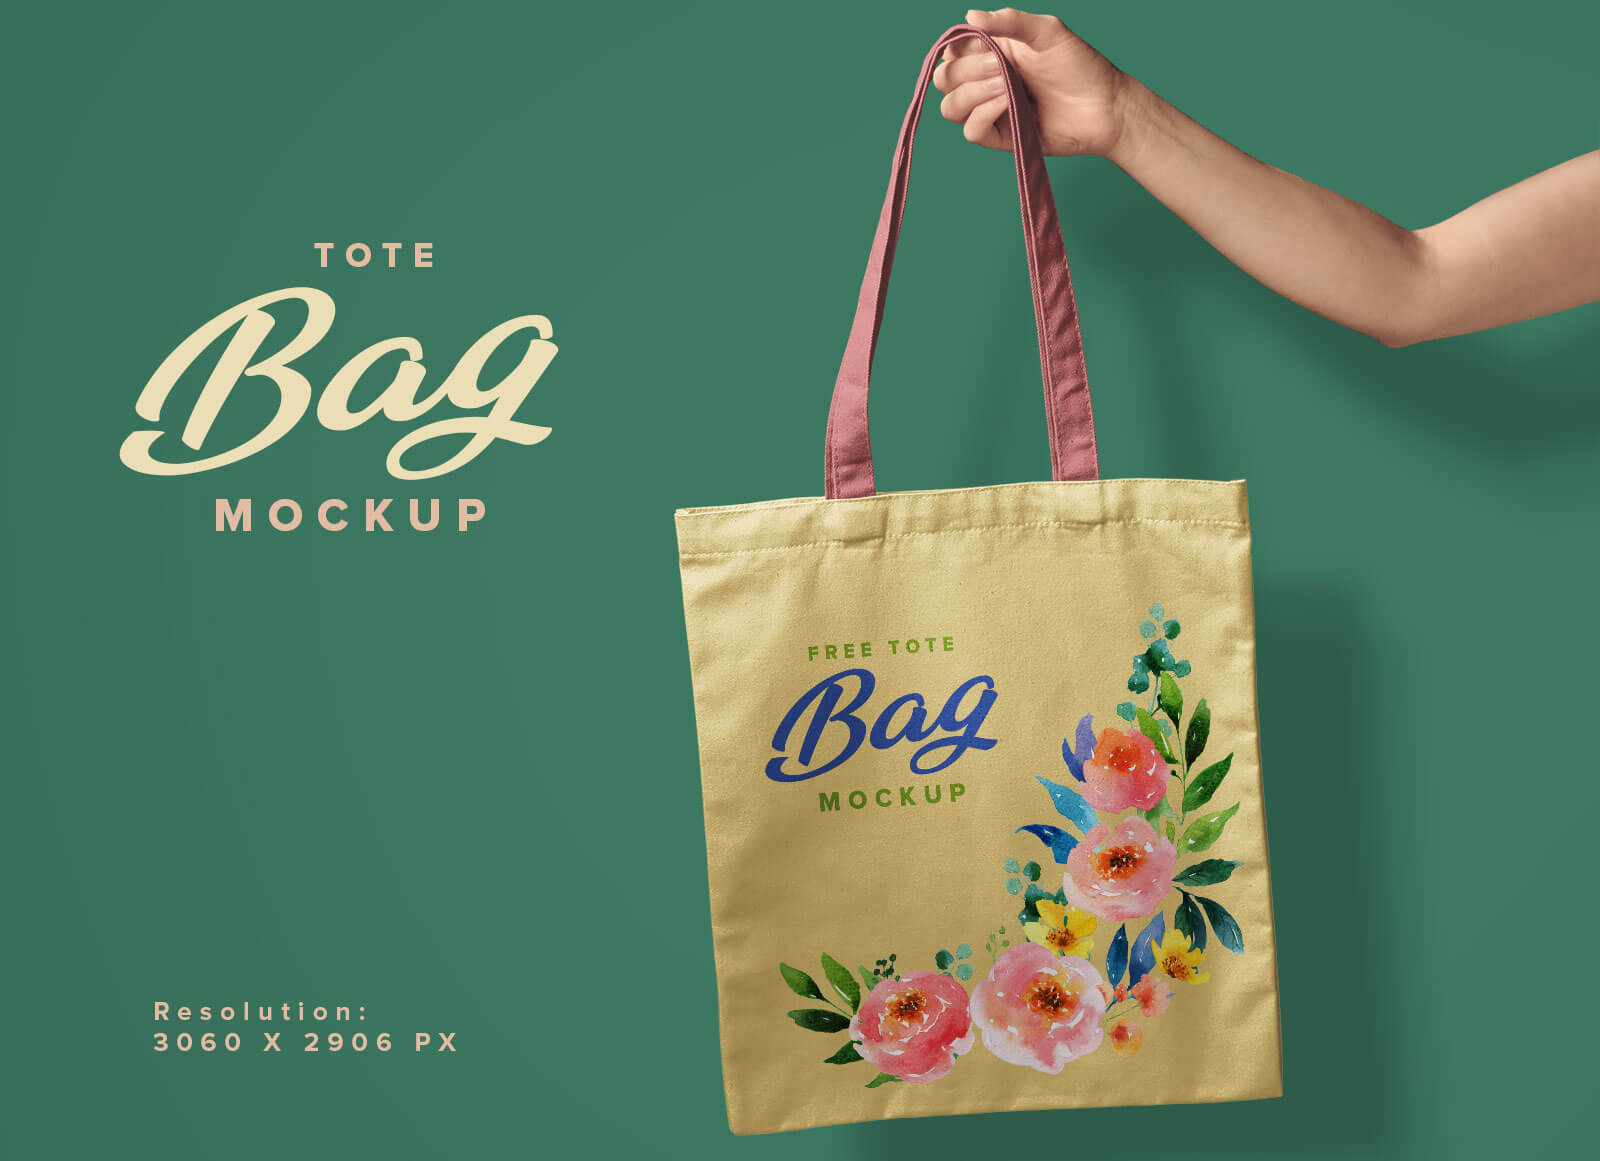 50+ branding psd pouch mockup. Free Hand Holding Tote Shopping Bag Mockup Psd Good Mockups